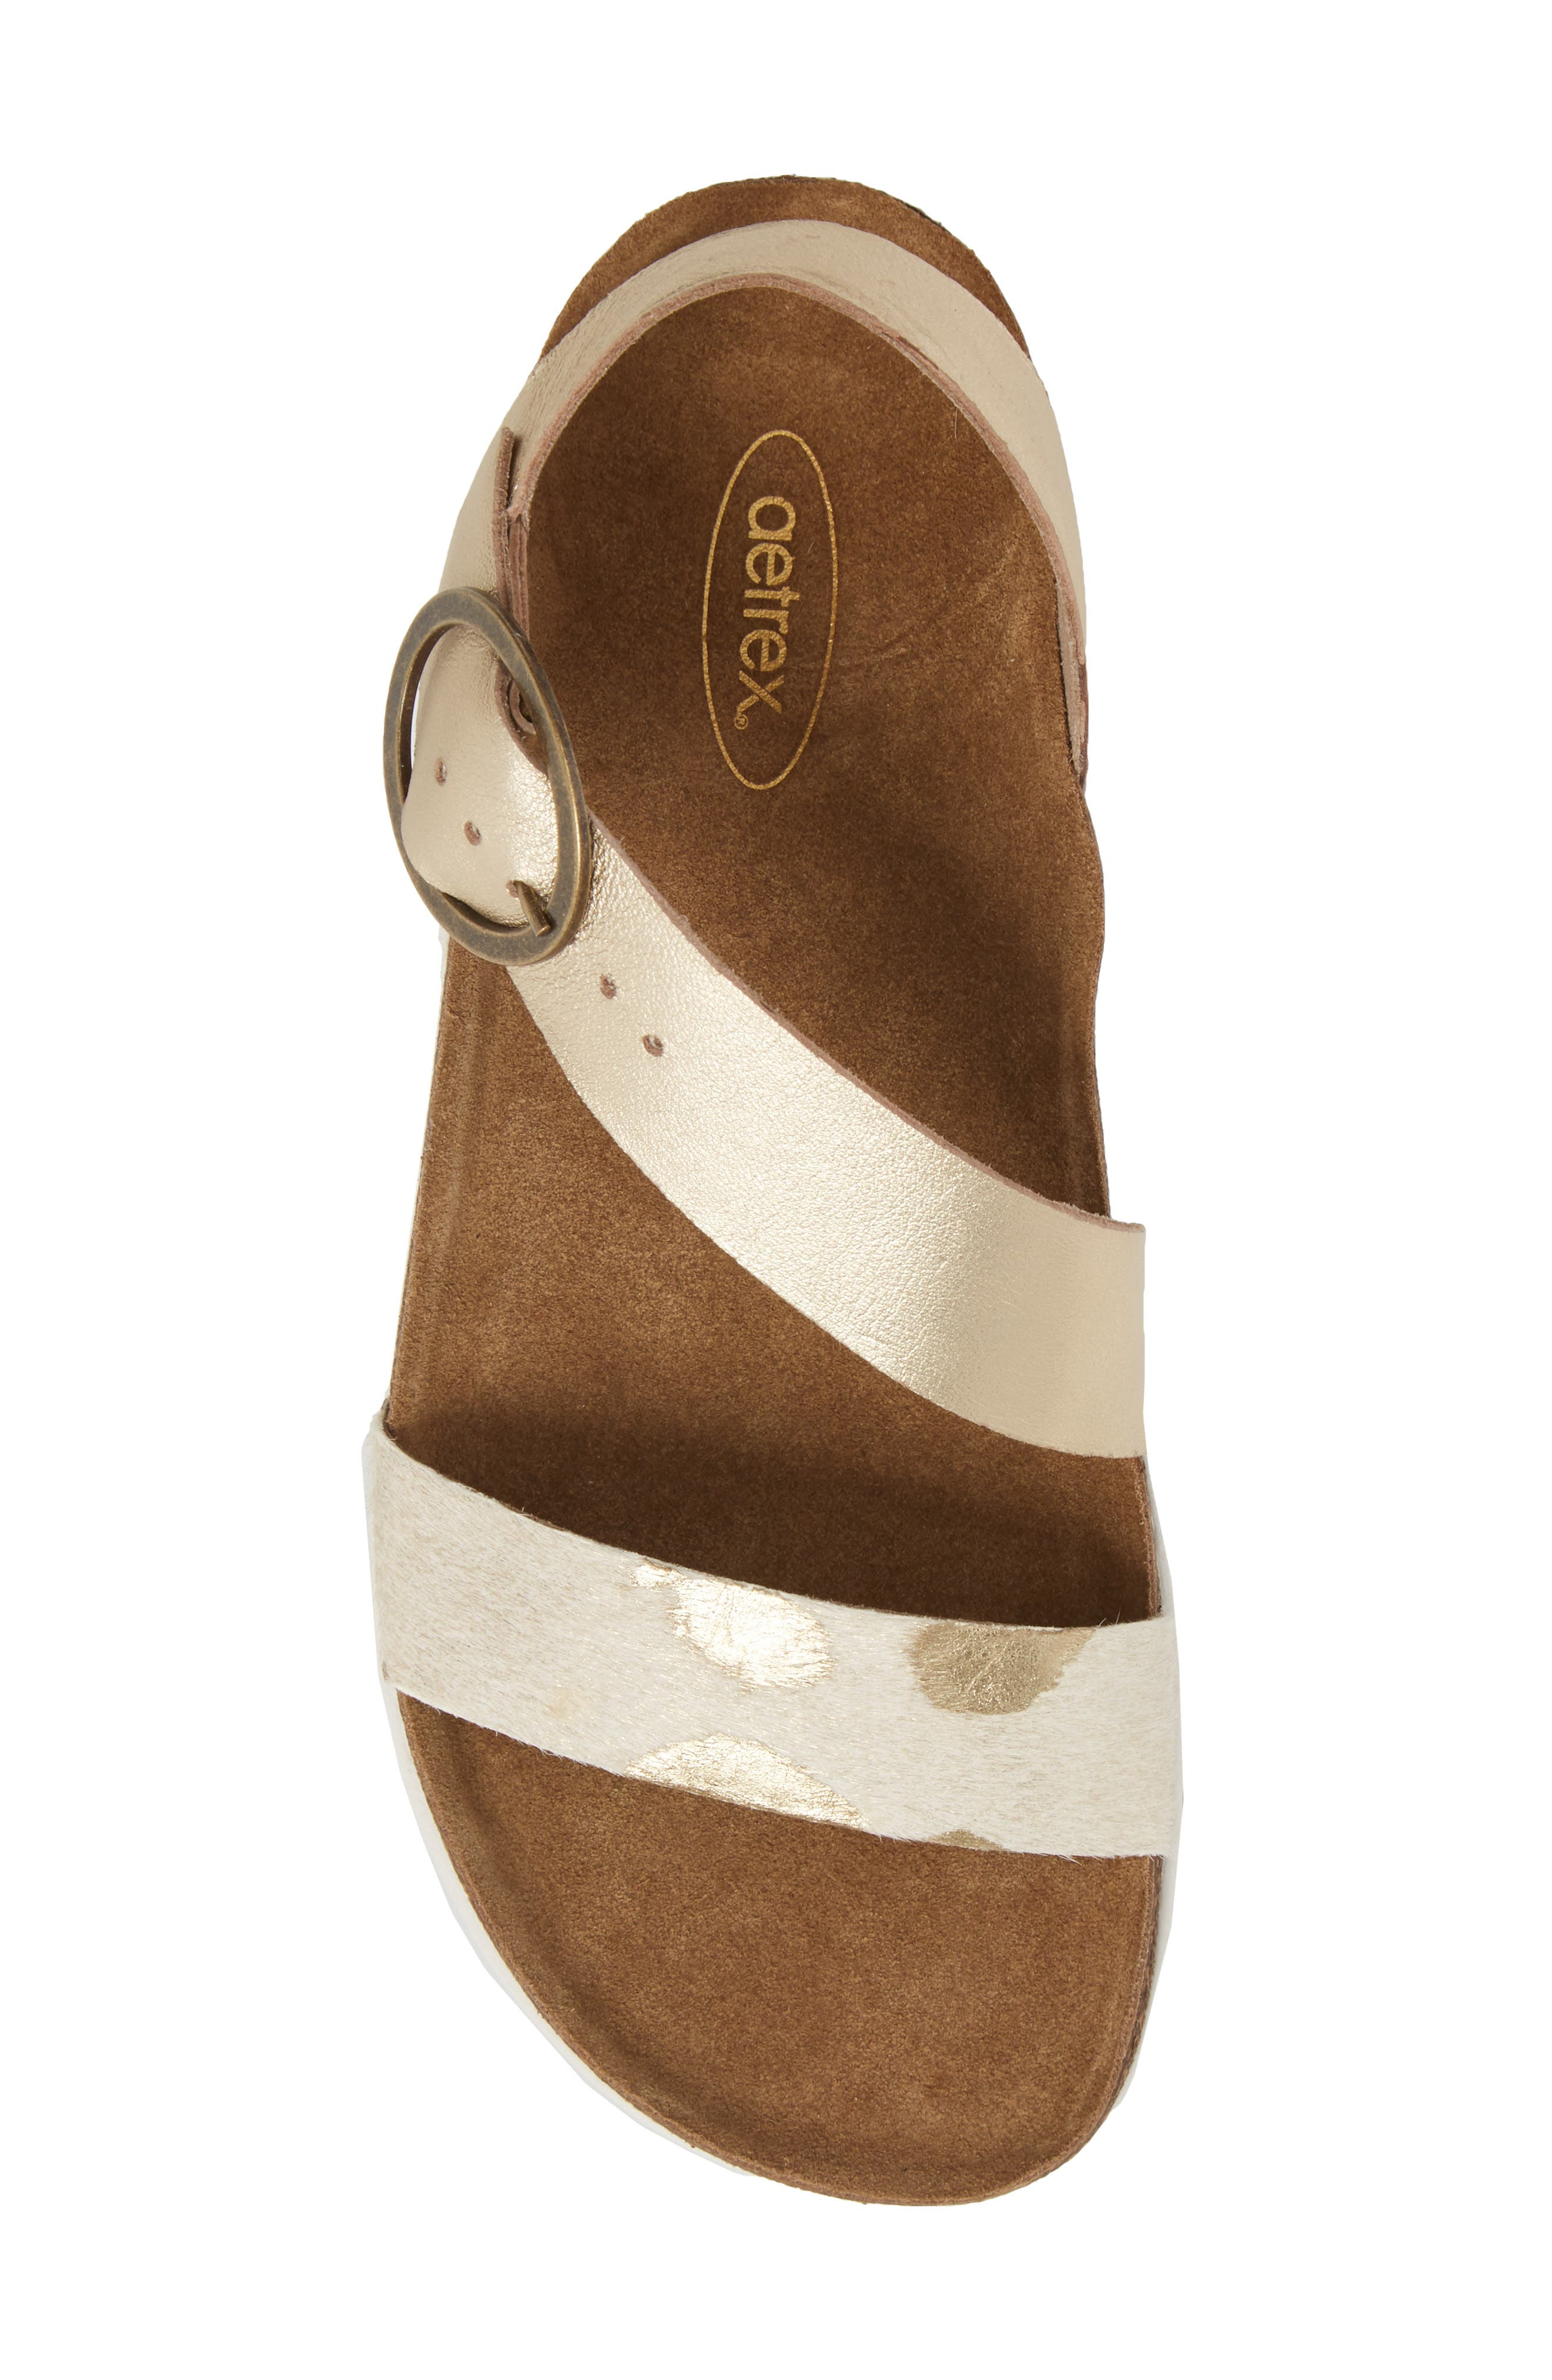 Adrianna Genuine Calf Hair Sandal,                             Alternate thumbnail 5, color,                             Gold Pony Leather